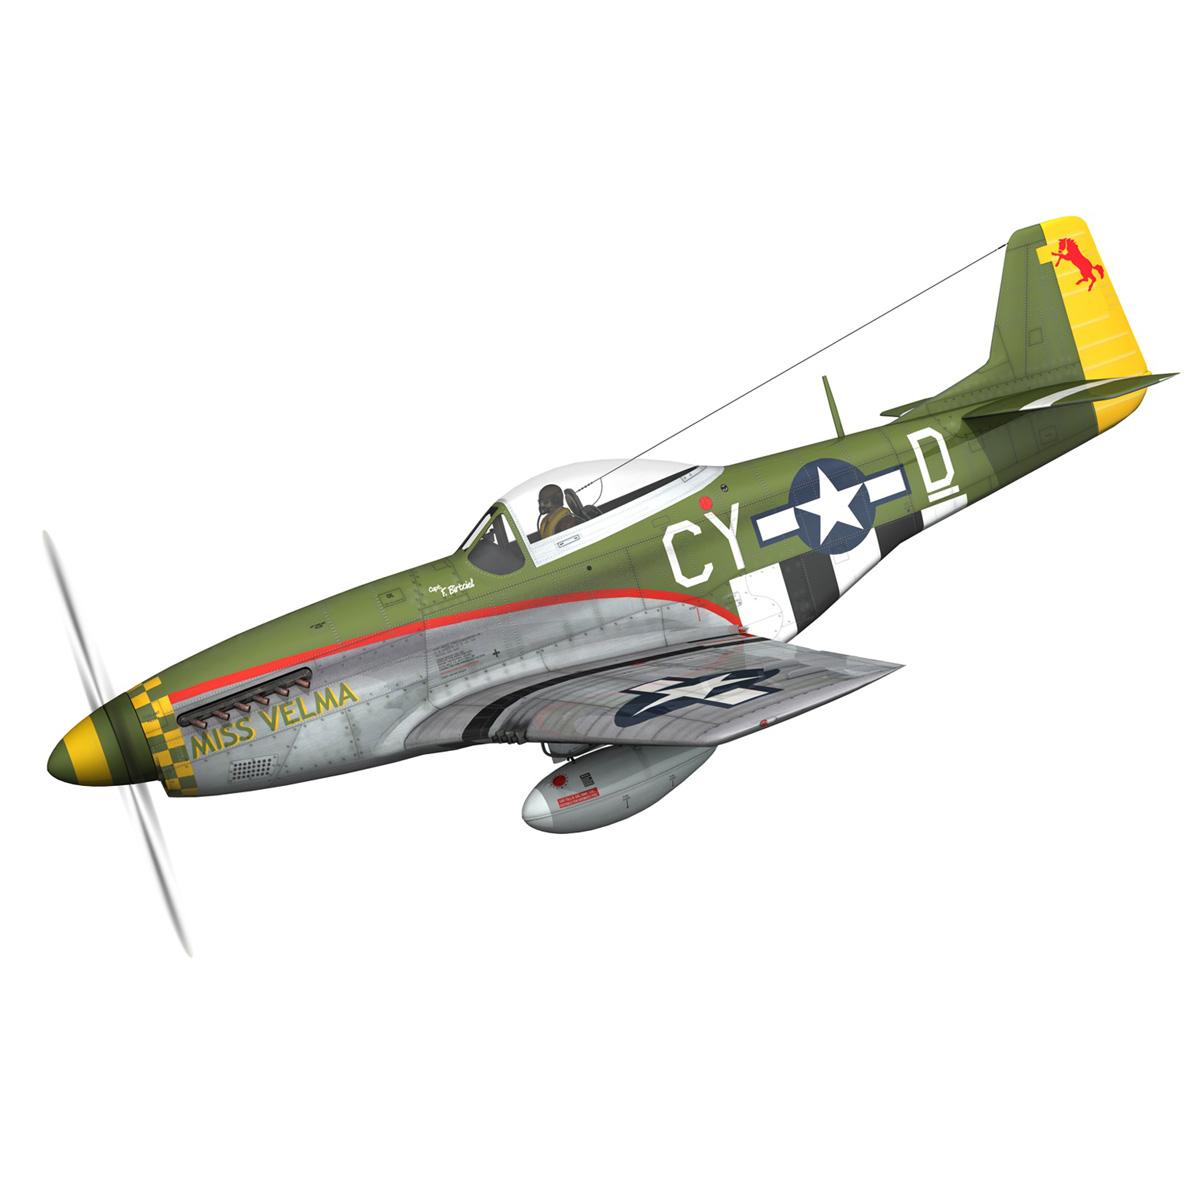 north american p-51d – mustang – miss velma 3d model 3ds fbx c4d lwo obj 267618